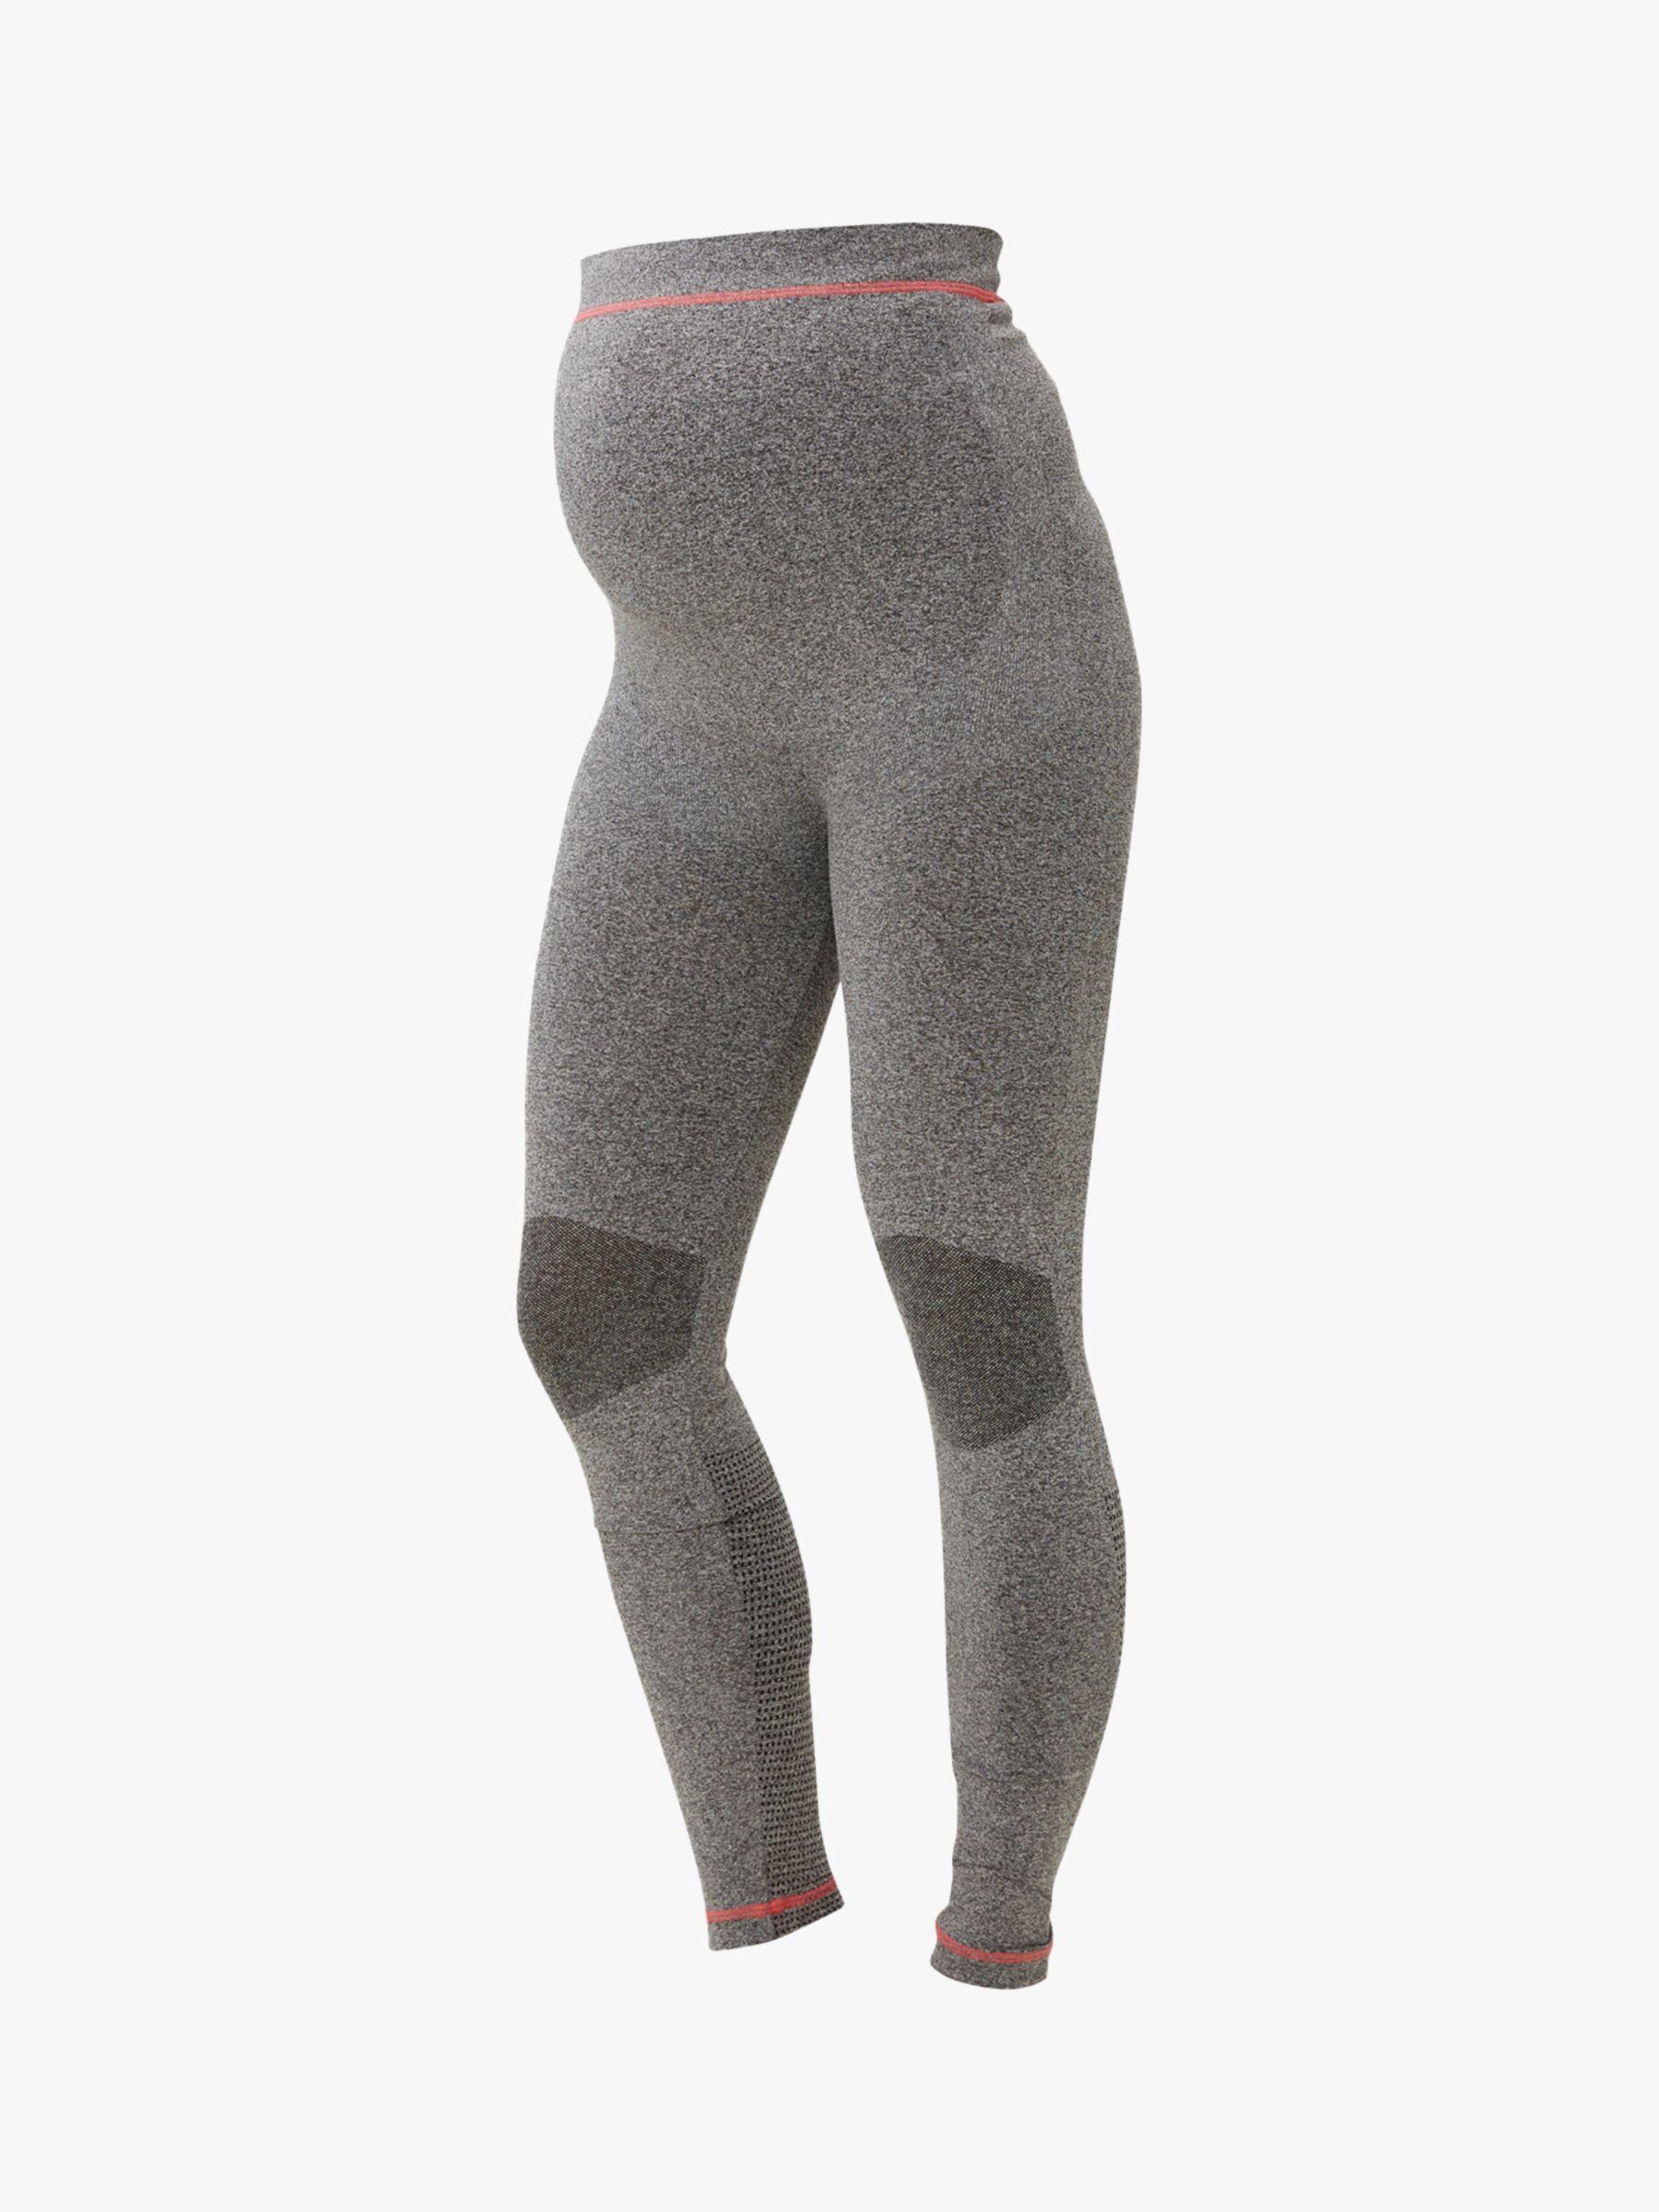 Mamalicious Mamalicious Fit Active Maternity Leggings, Grey